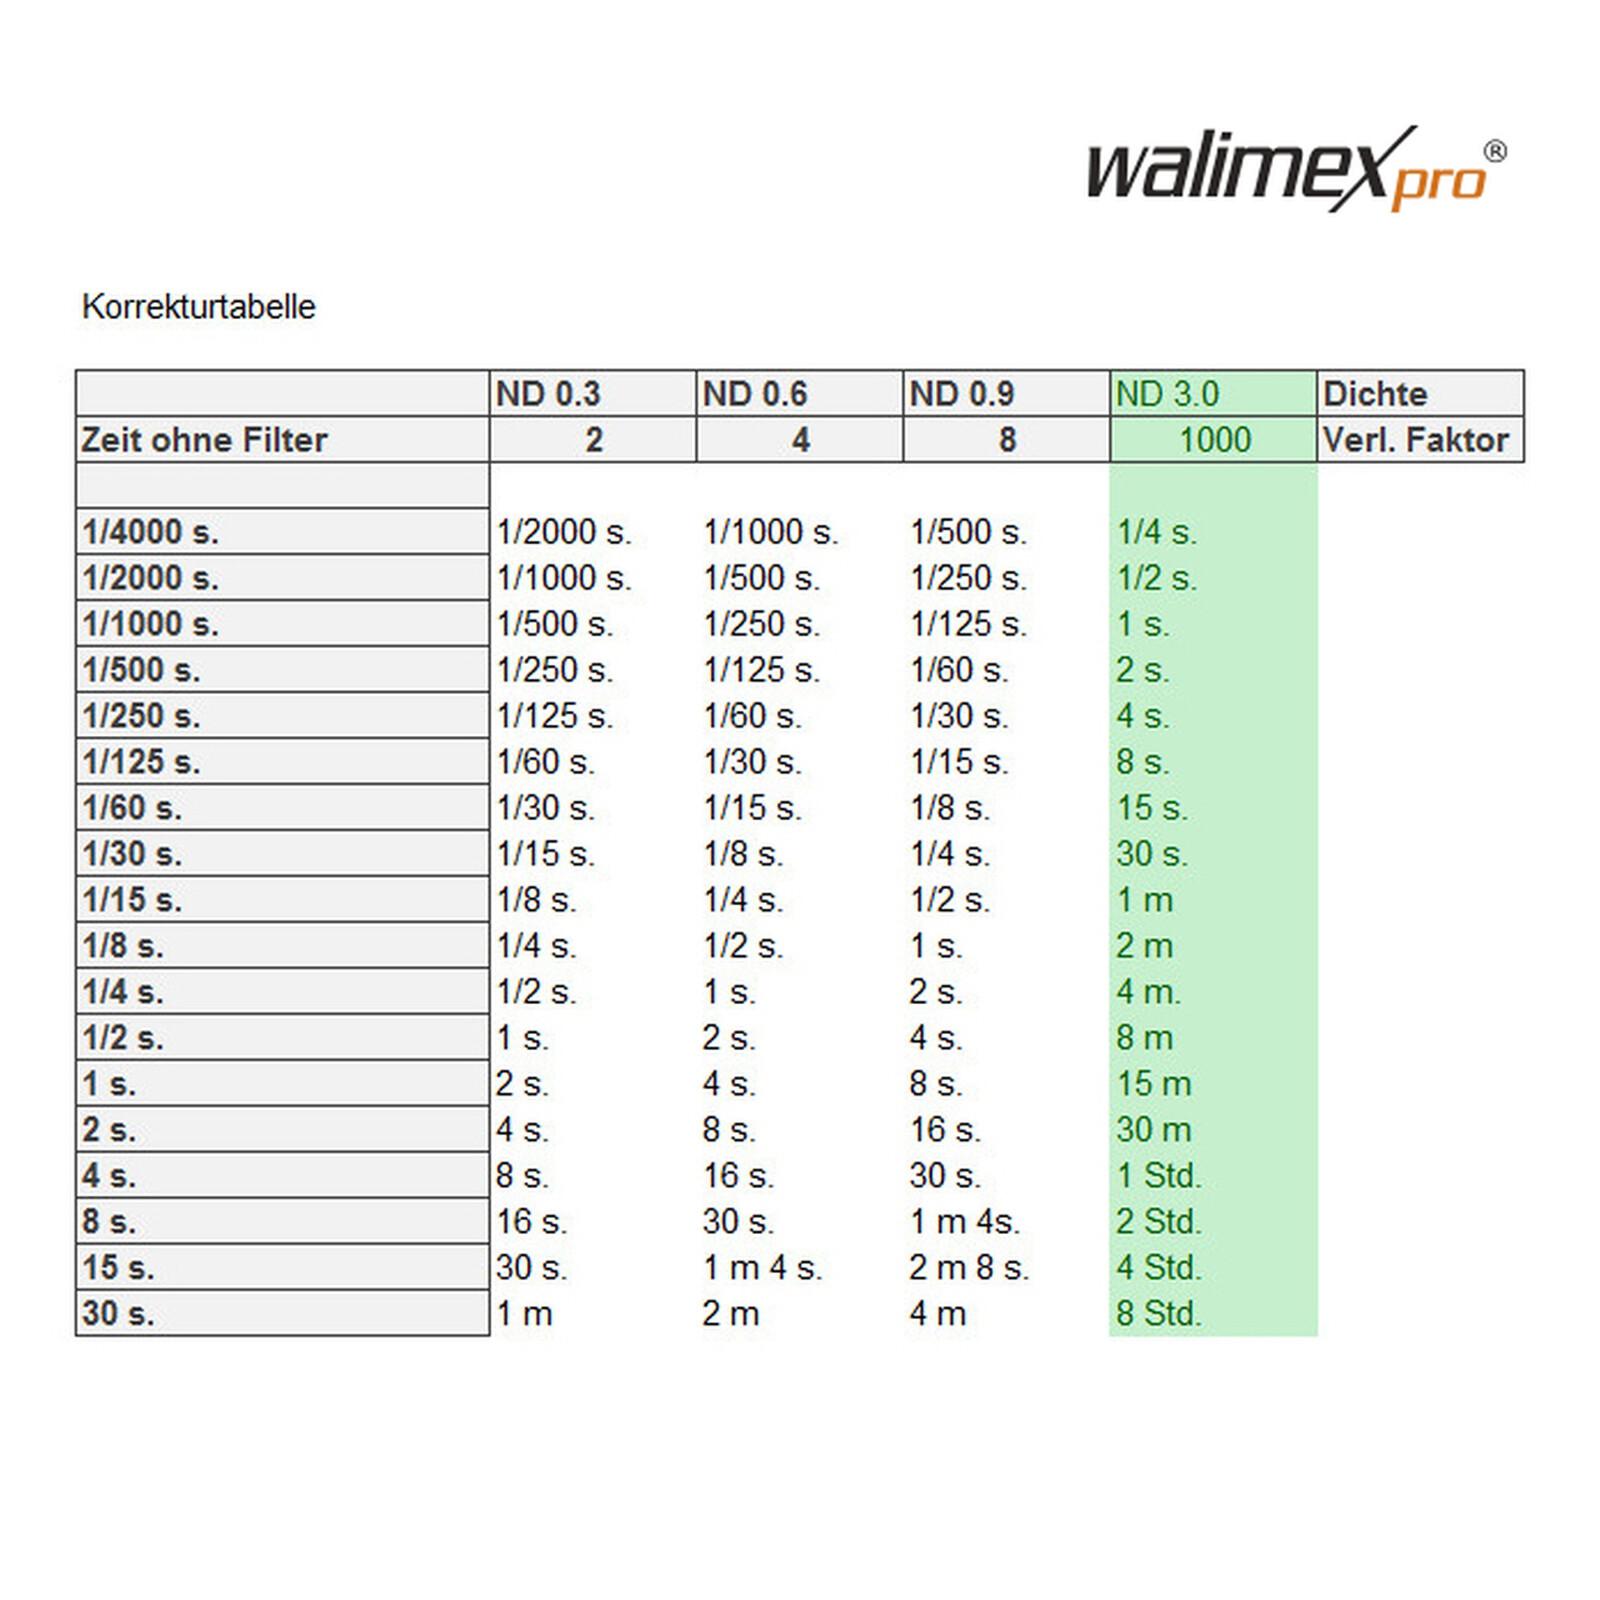 walimex pro Slim Graufilter ND1000 vergütet 72 mm